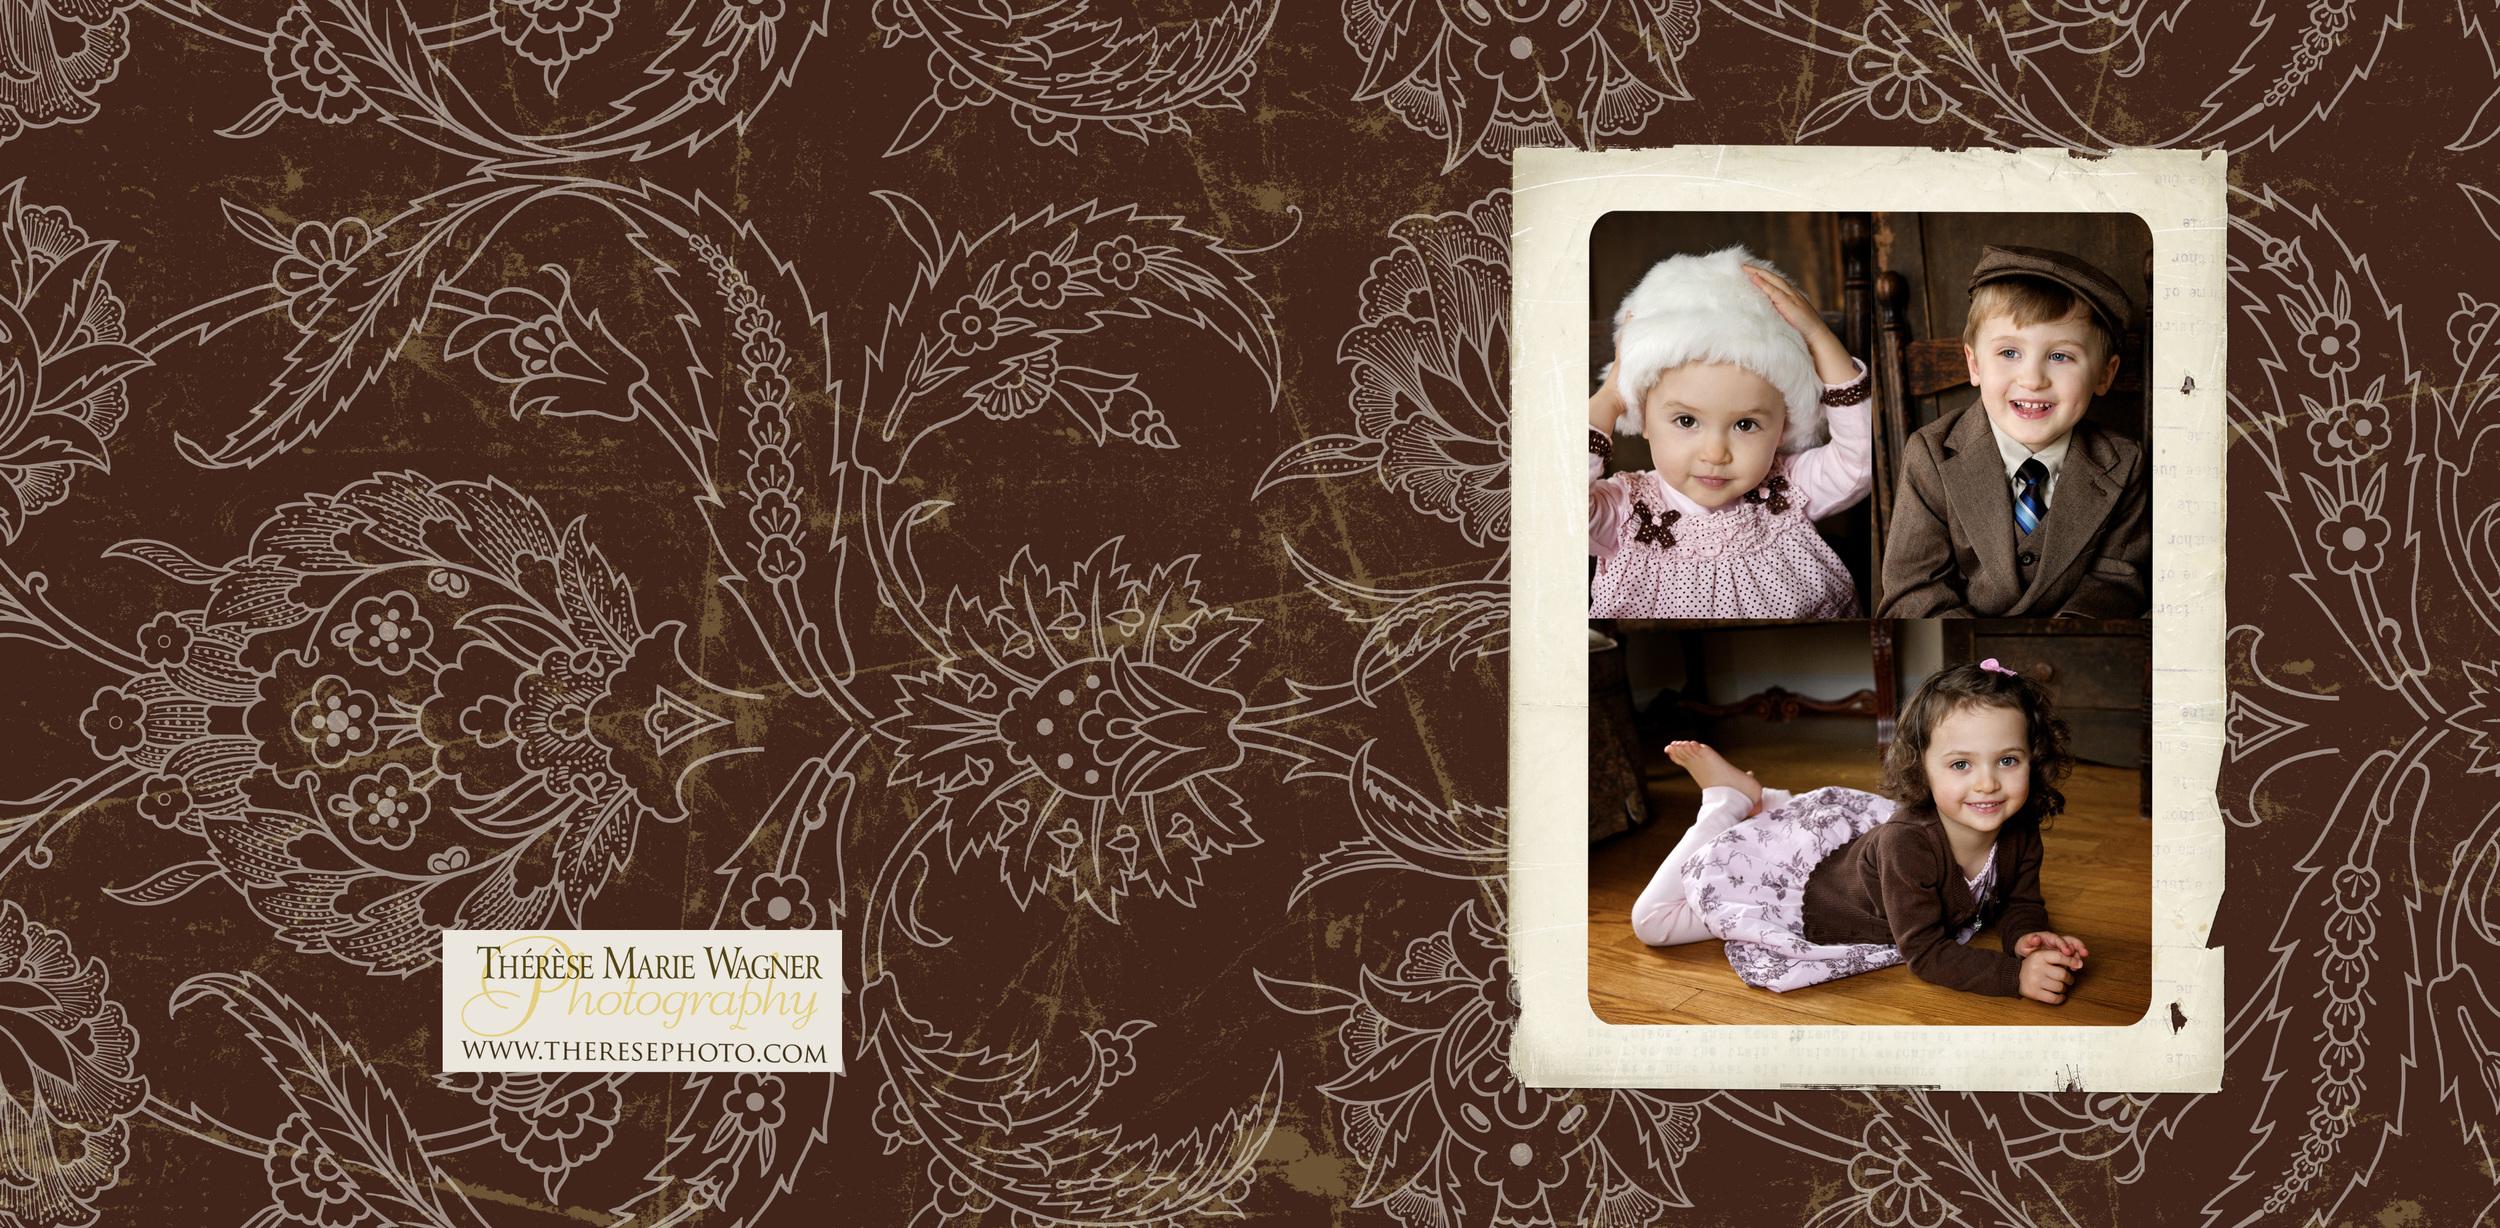 5x5 Book Cover